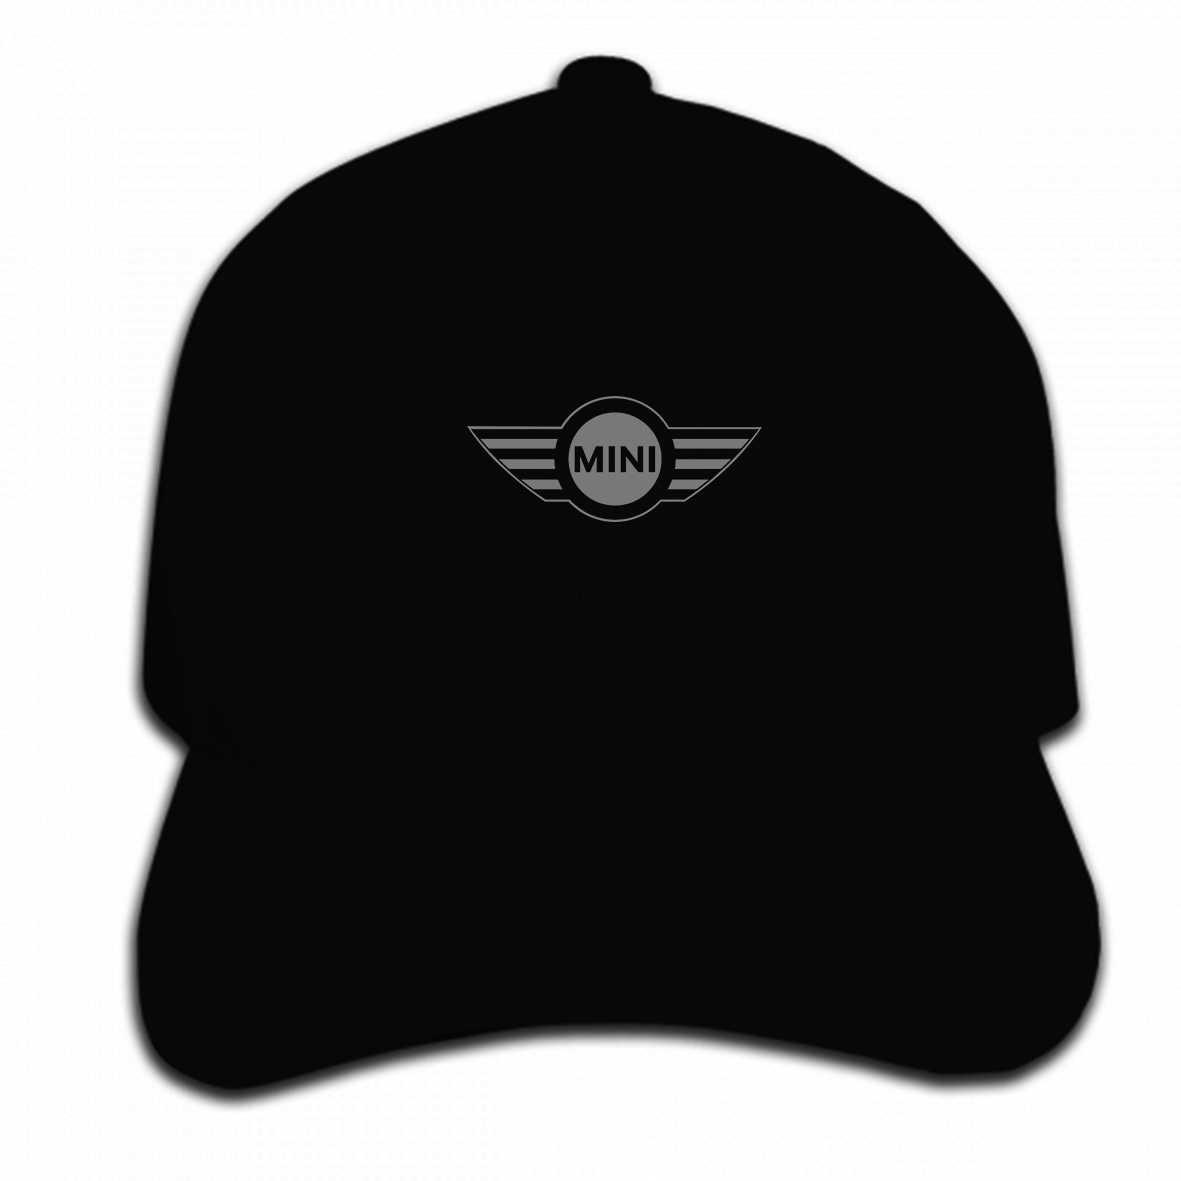 ce2dae77b39 Print Custom Baseball Cap fm10 men MINI COOPER machine print SILVER SPORT  Women Hat Peaked cap